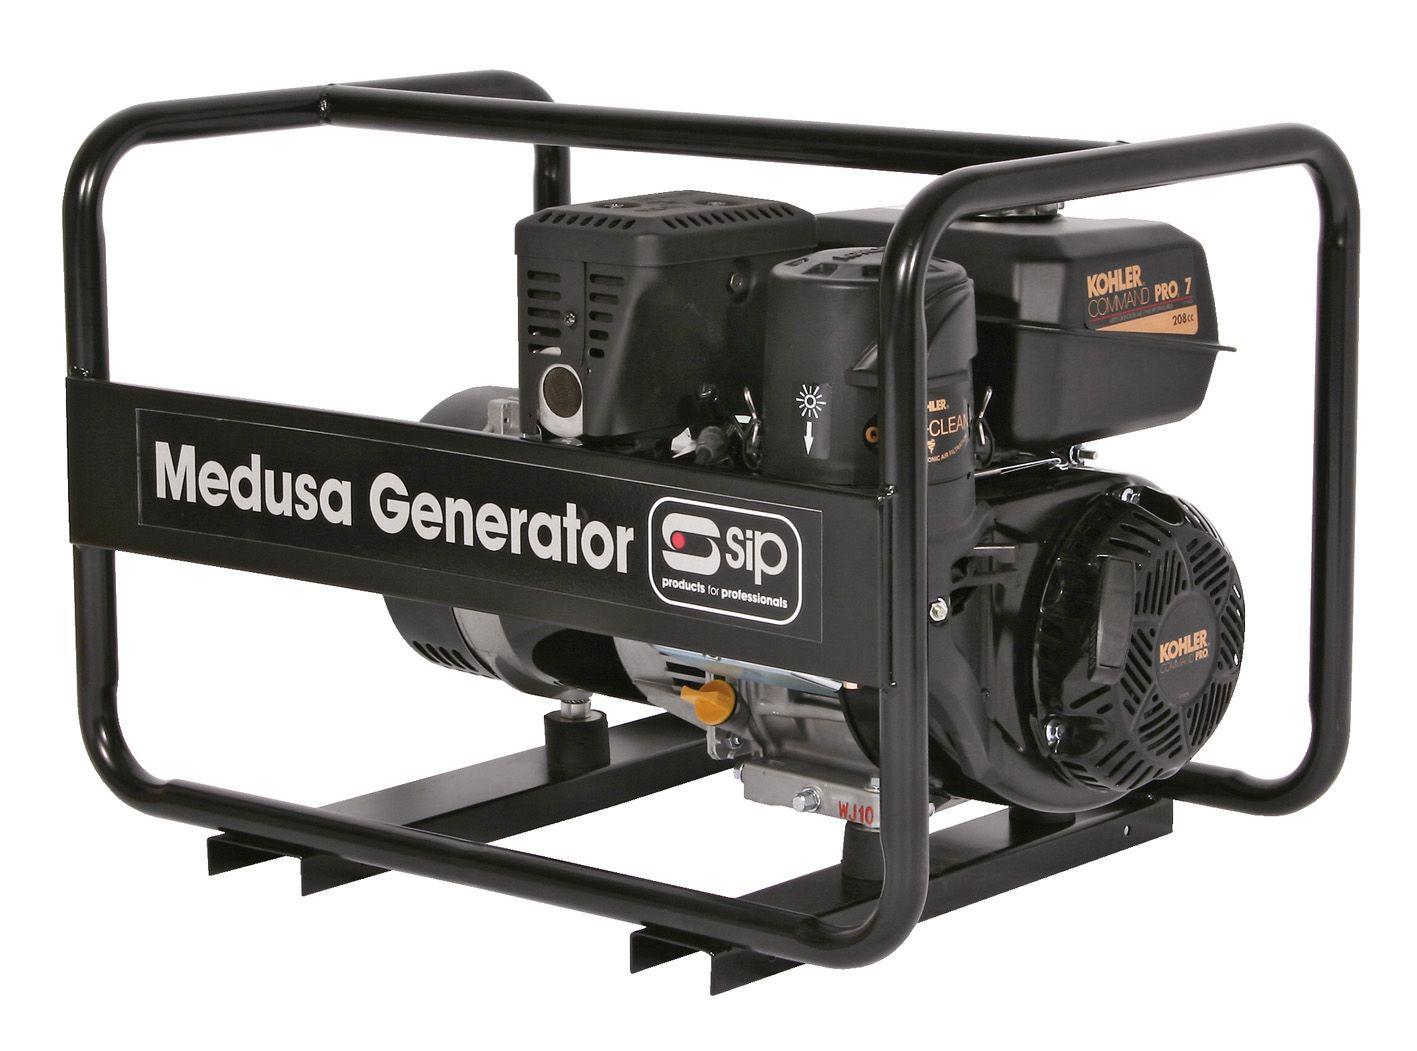 Sip Trade Medusa MGKP2.5F 2.75Kva Kohler Engine Generator Full Frame